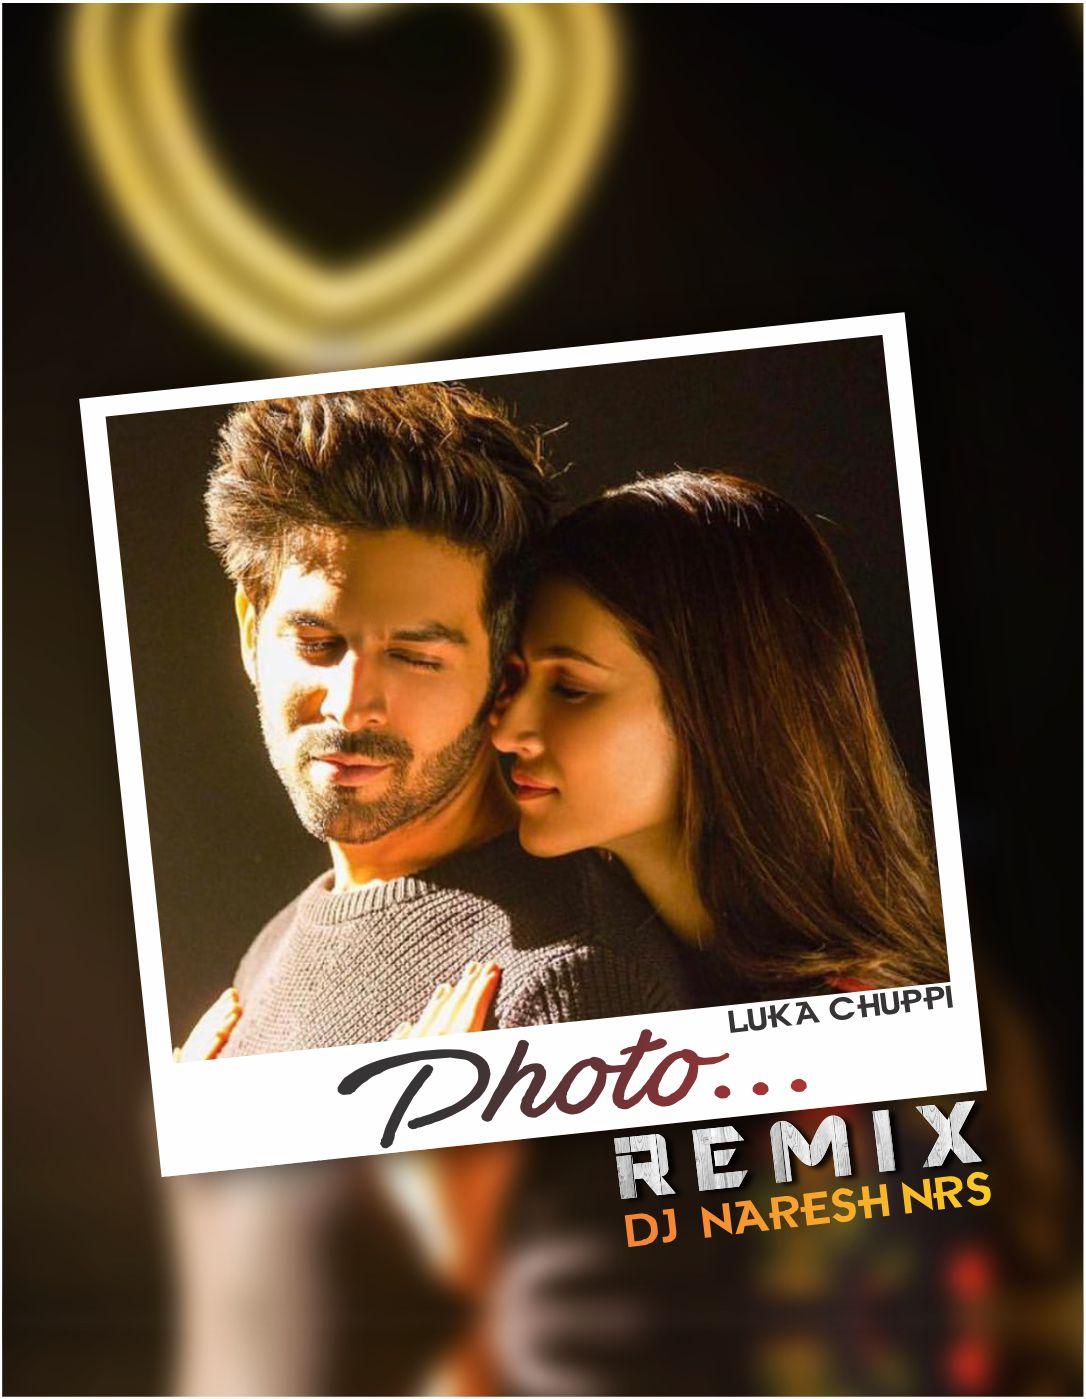 Photo (Luka Chuppi) Remix DJ NARESH NRS | 2019 - DJ NARESH NRS